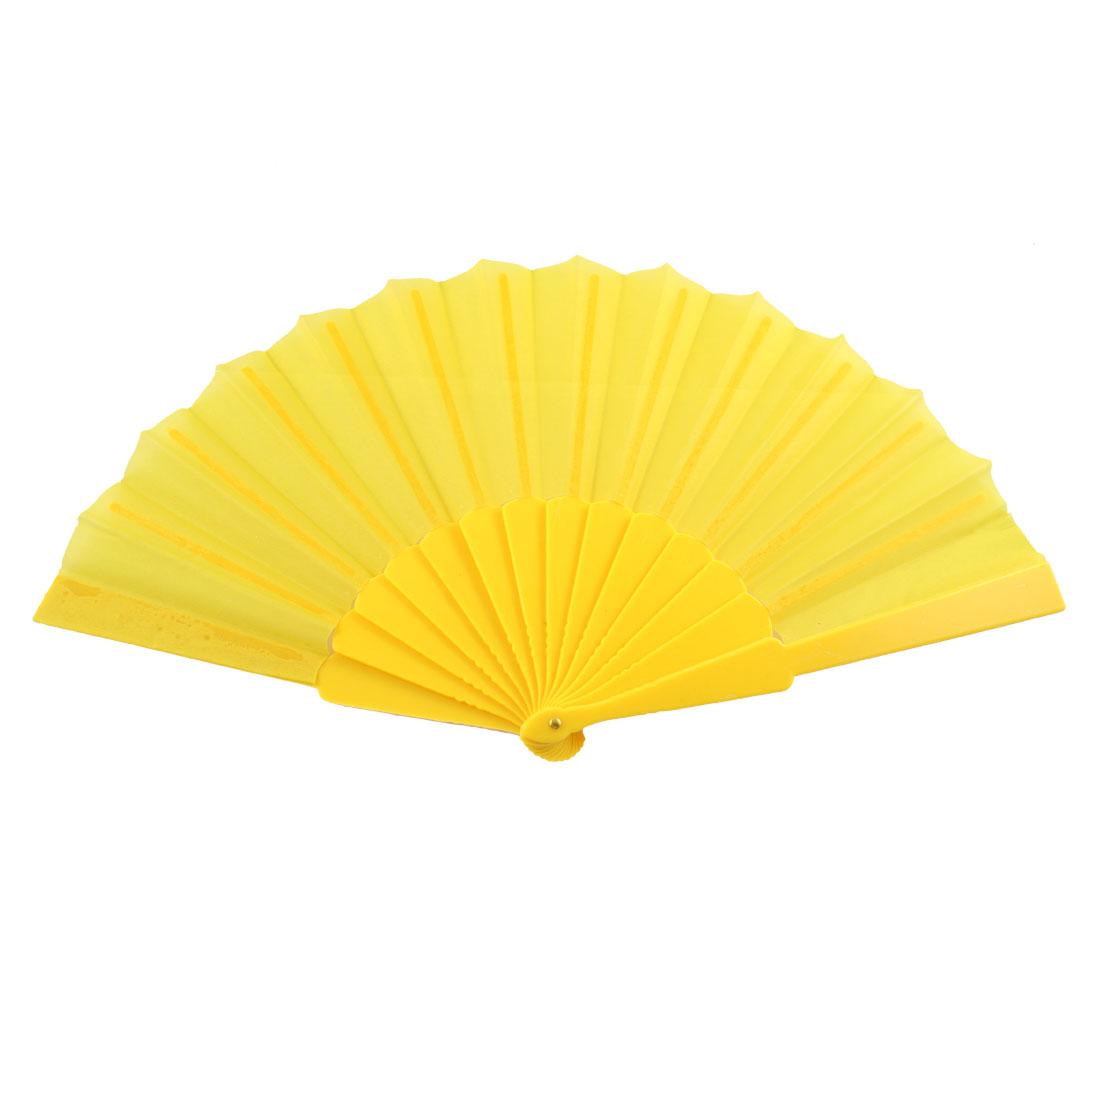 Houseware Yellow Plastic Handle Folding Summer Dancing Hand Fan